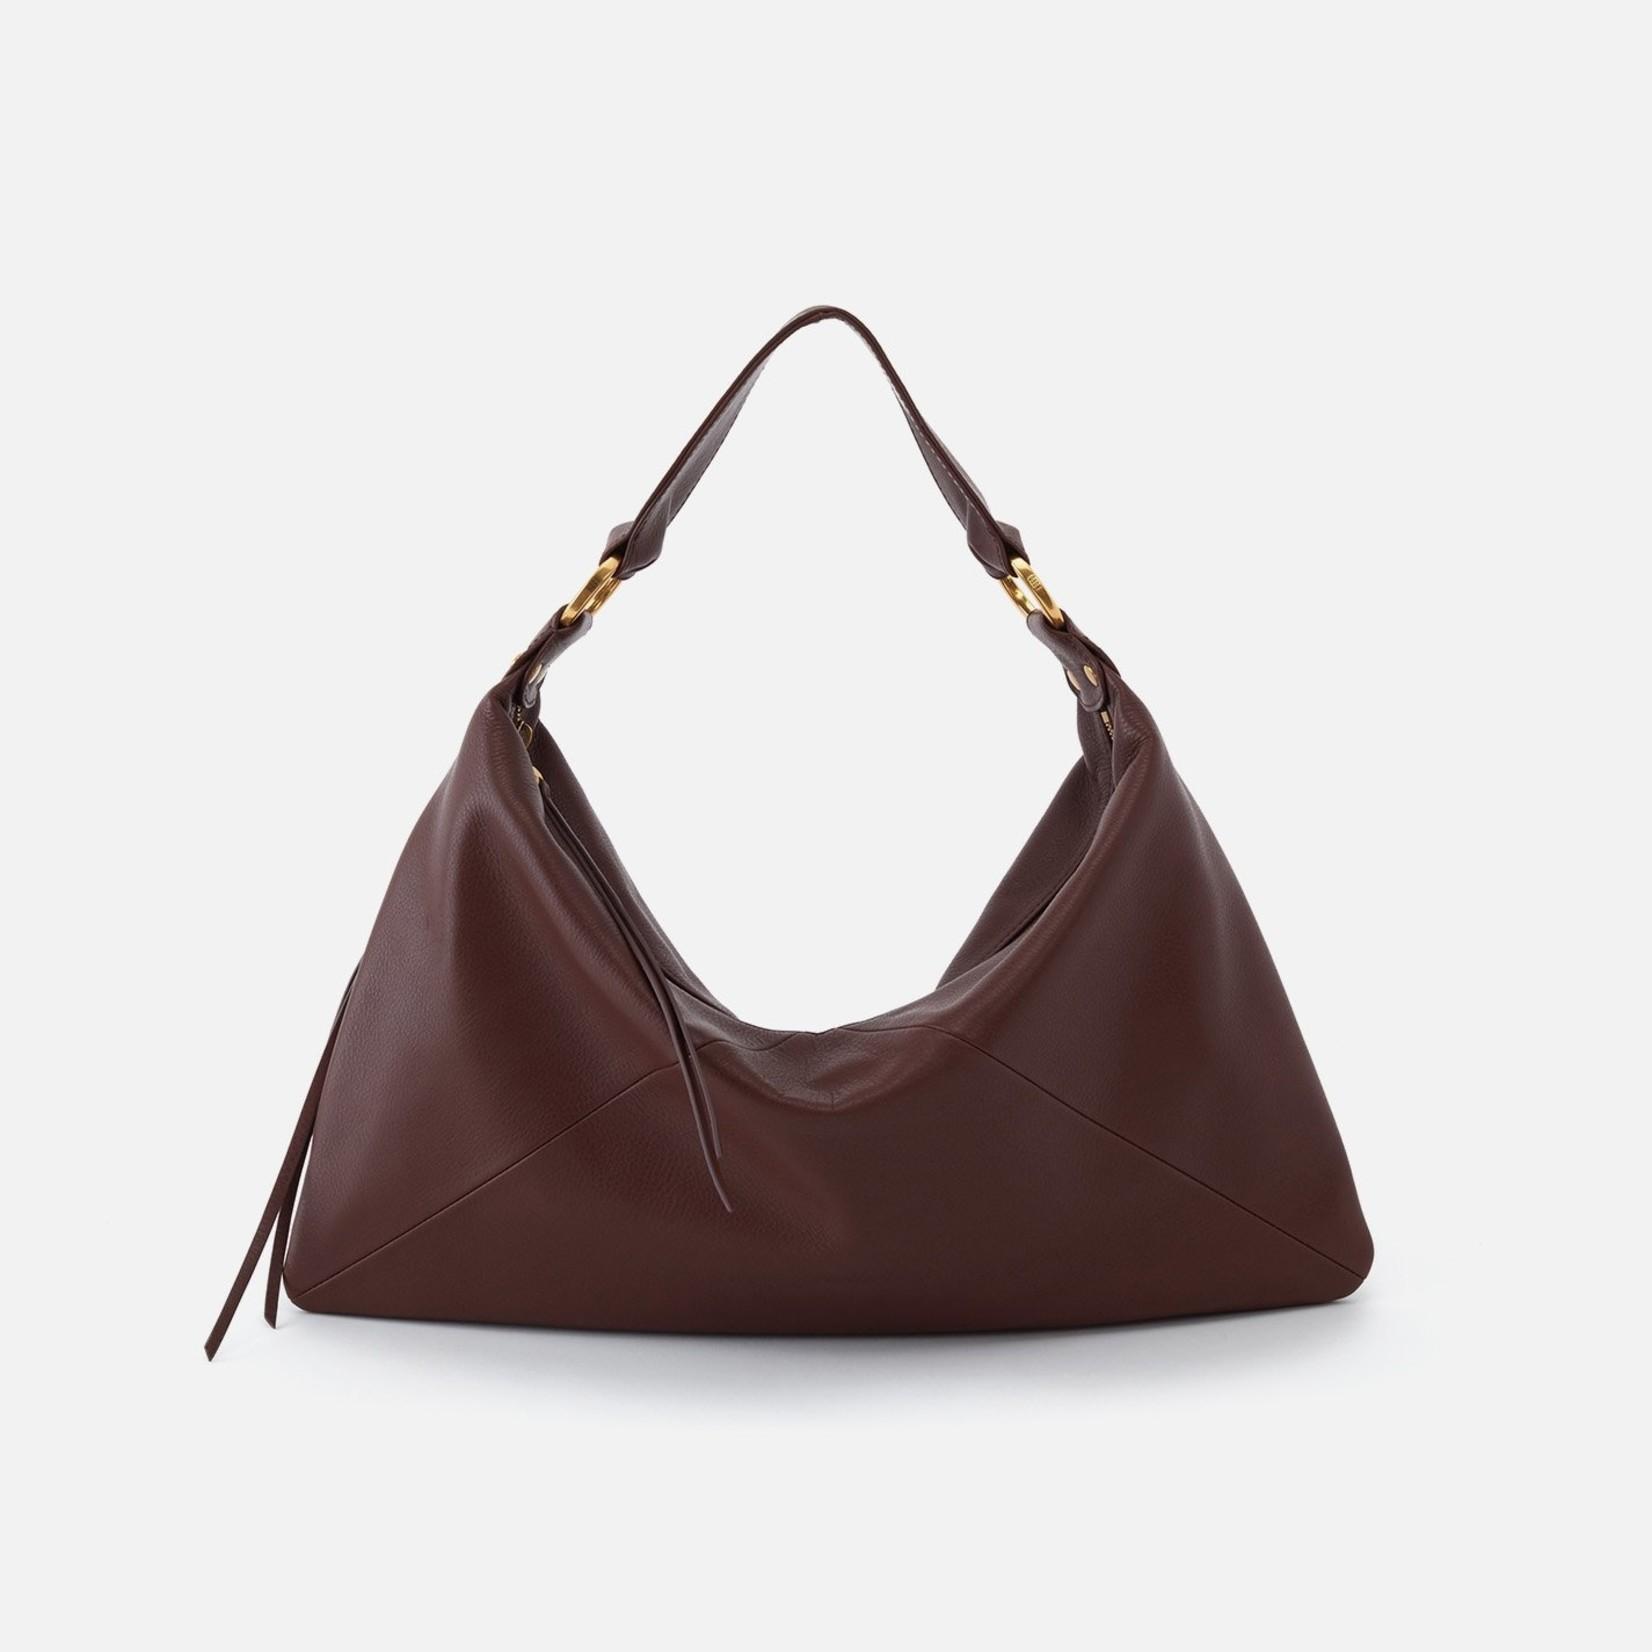 Paulette Shoulder Bag Mahogany